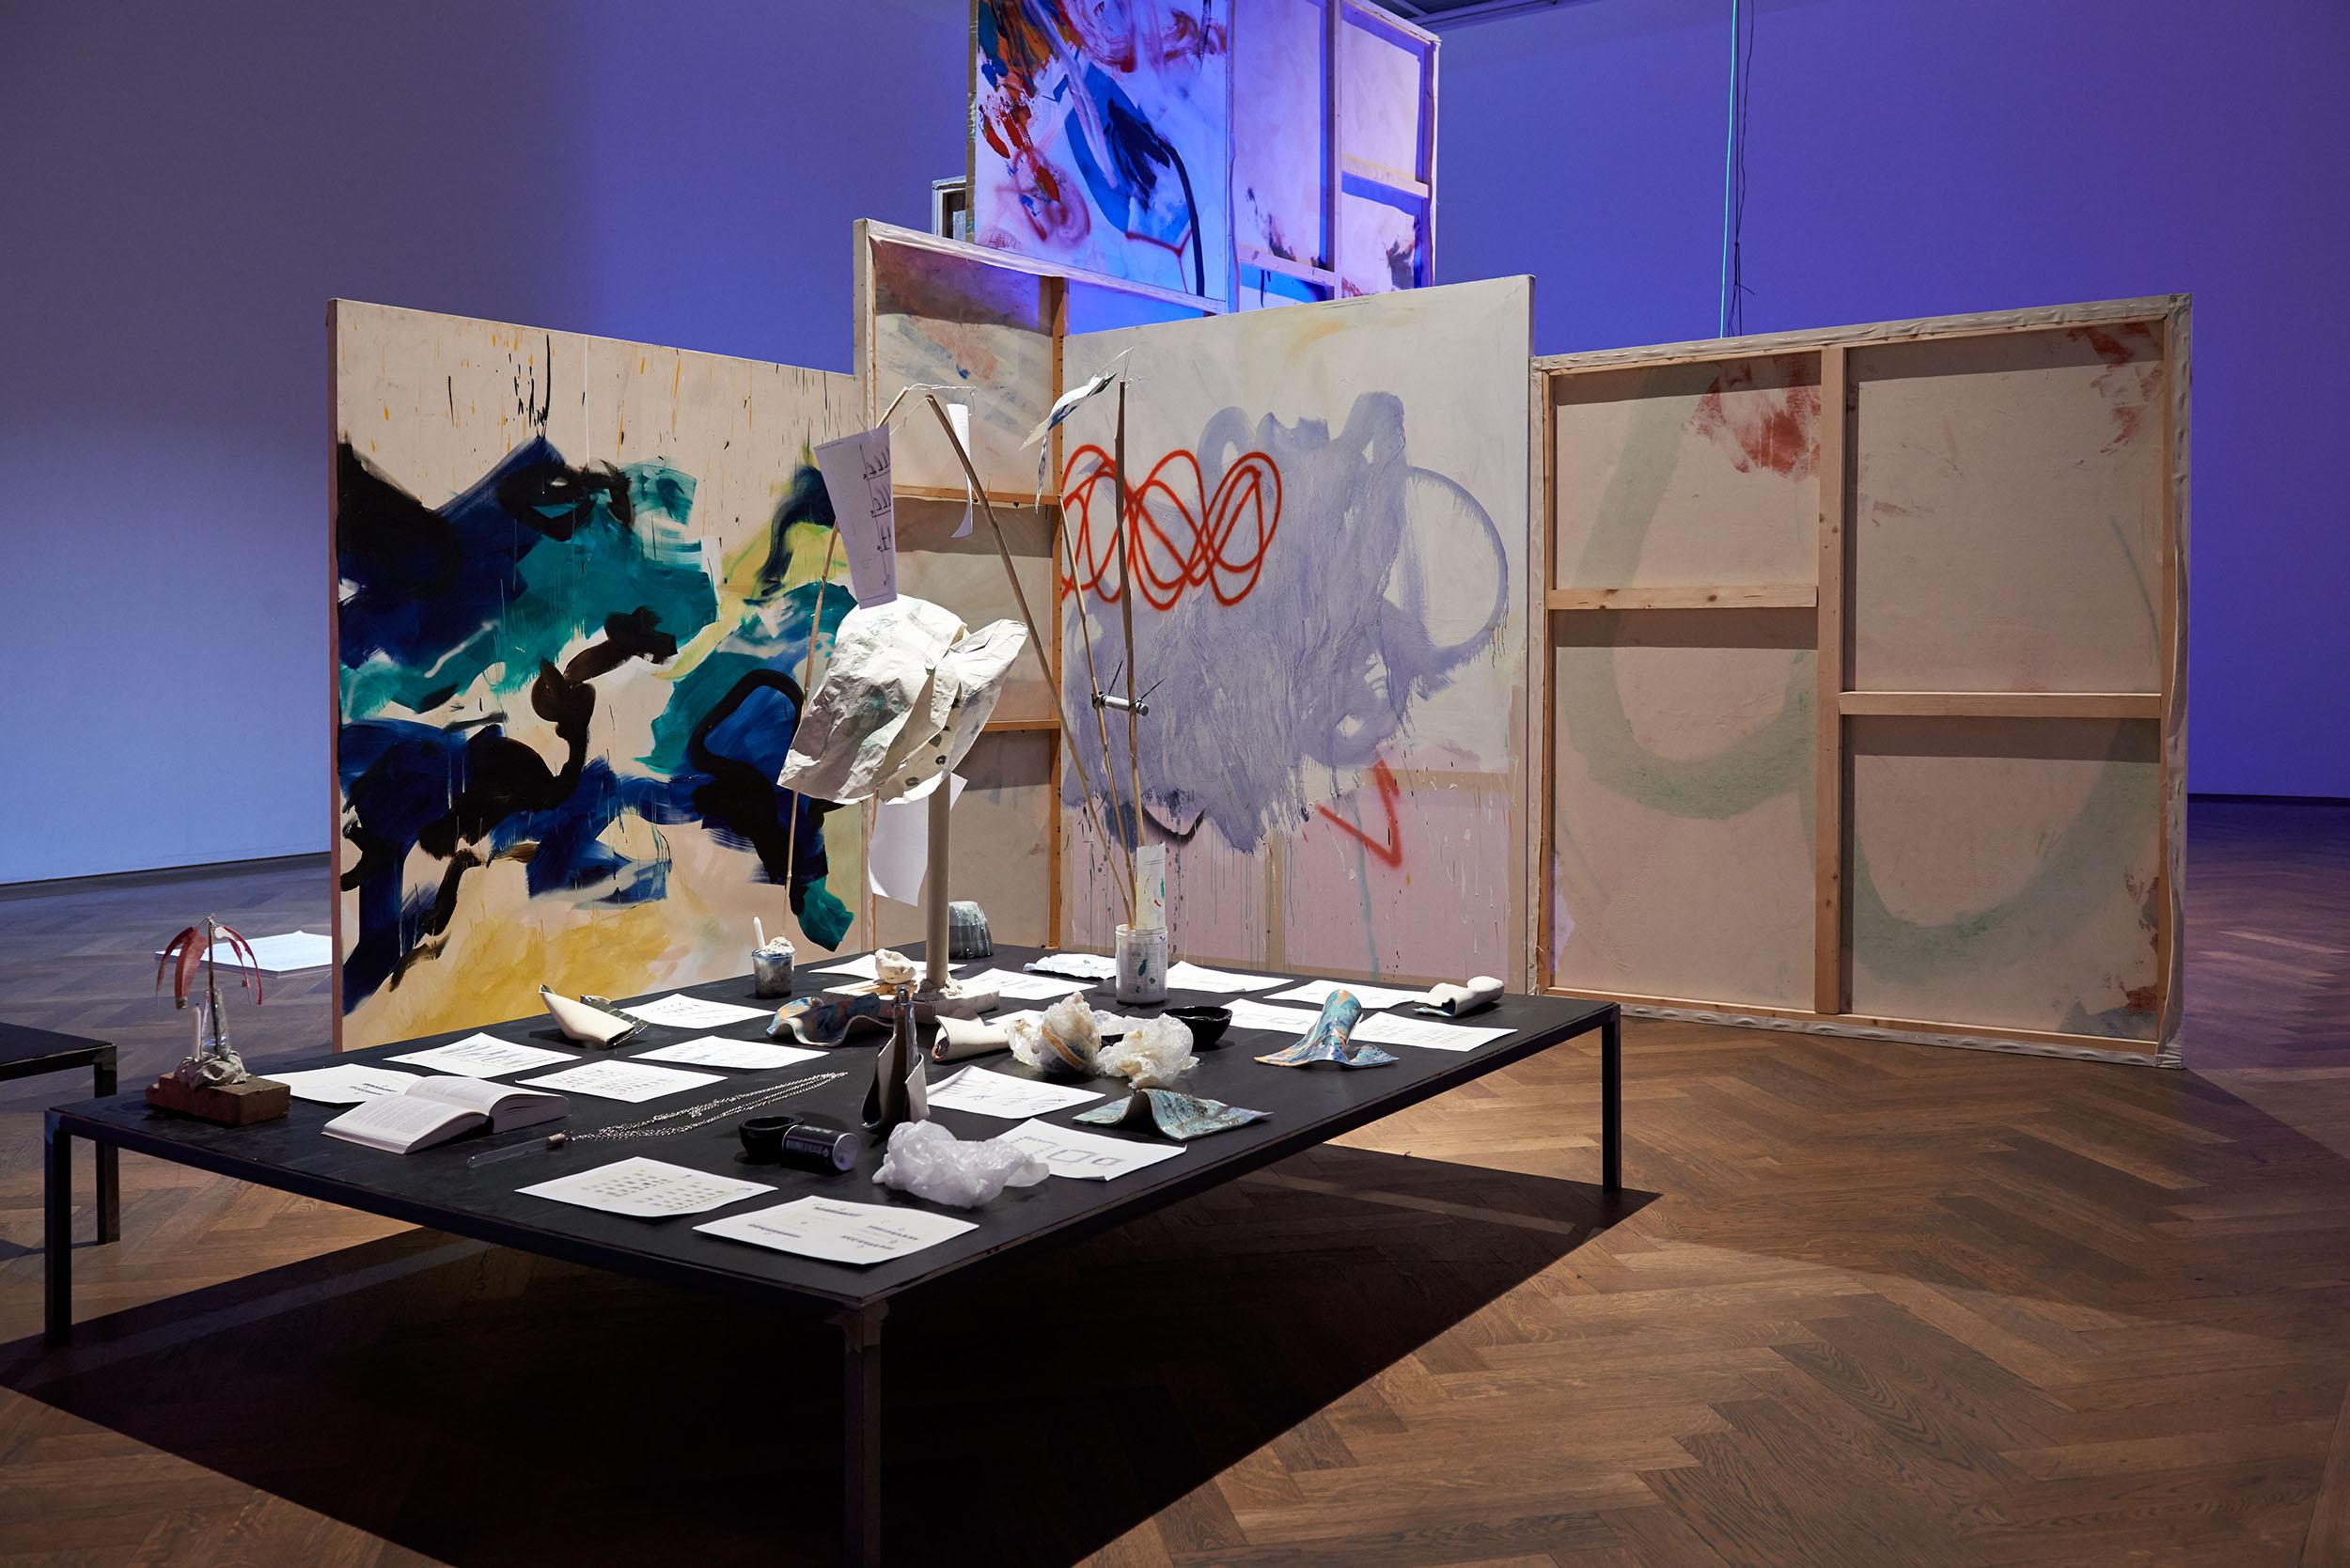 Louise Guerra, Installationsansicht,Chapter 15 Sci-Fi Opera: Sleep Tracking App Loop Station Island, 2015,Jungs, hier kommt der Masterplan, Kunsthalle Basel, 2015.CourtesyLouise Guerra.